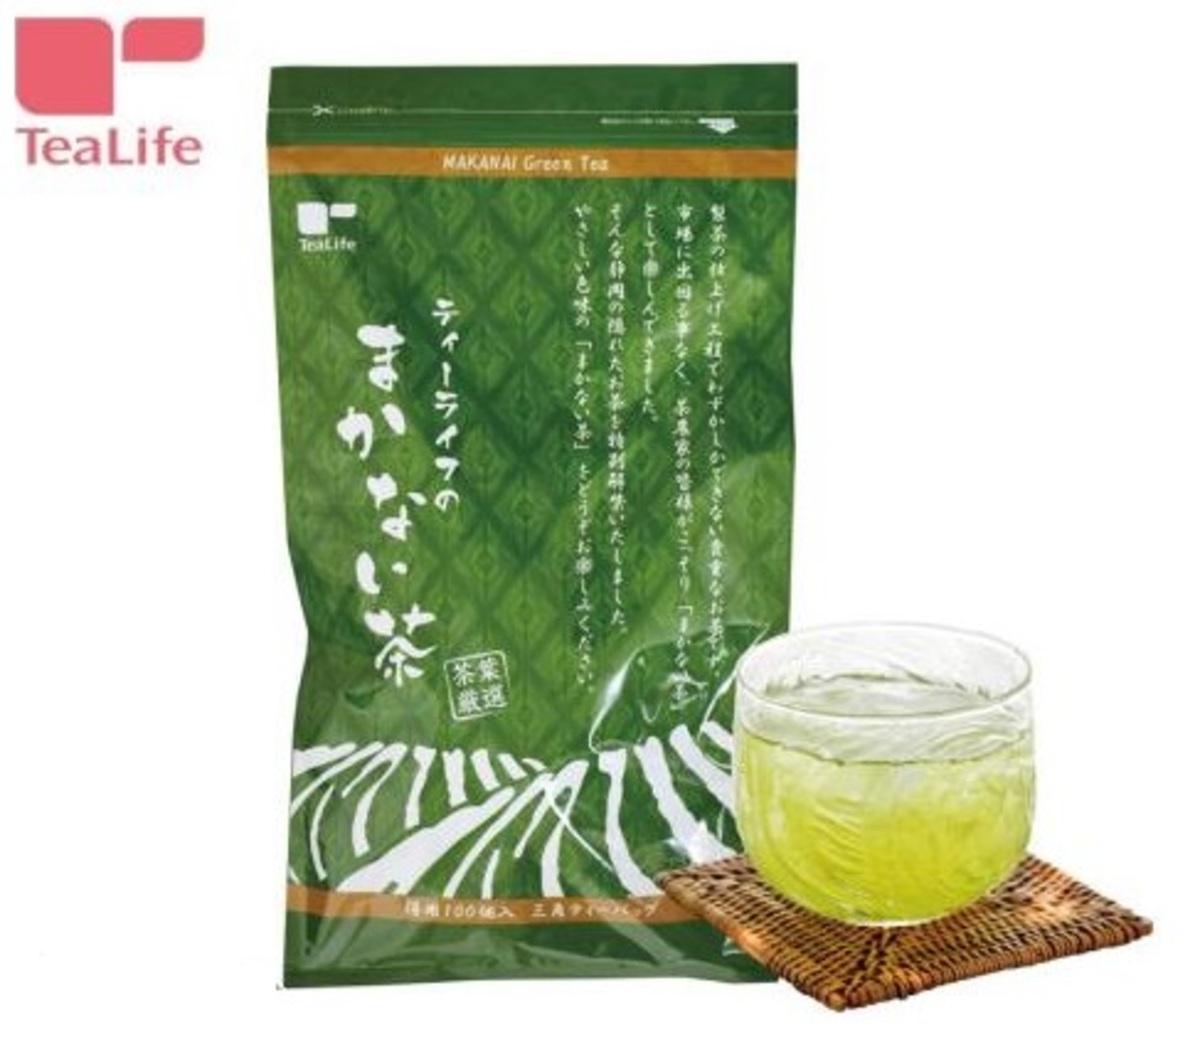 Makanai Green Tea